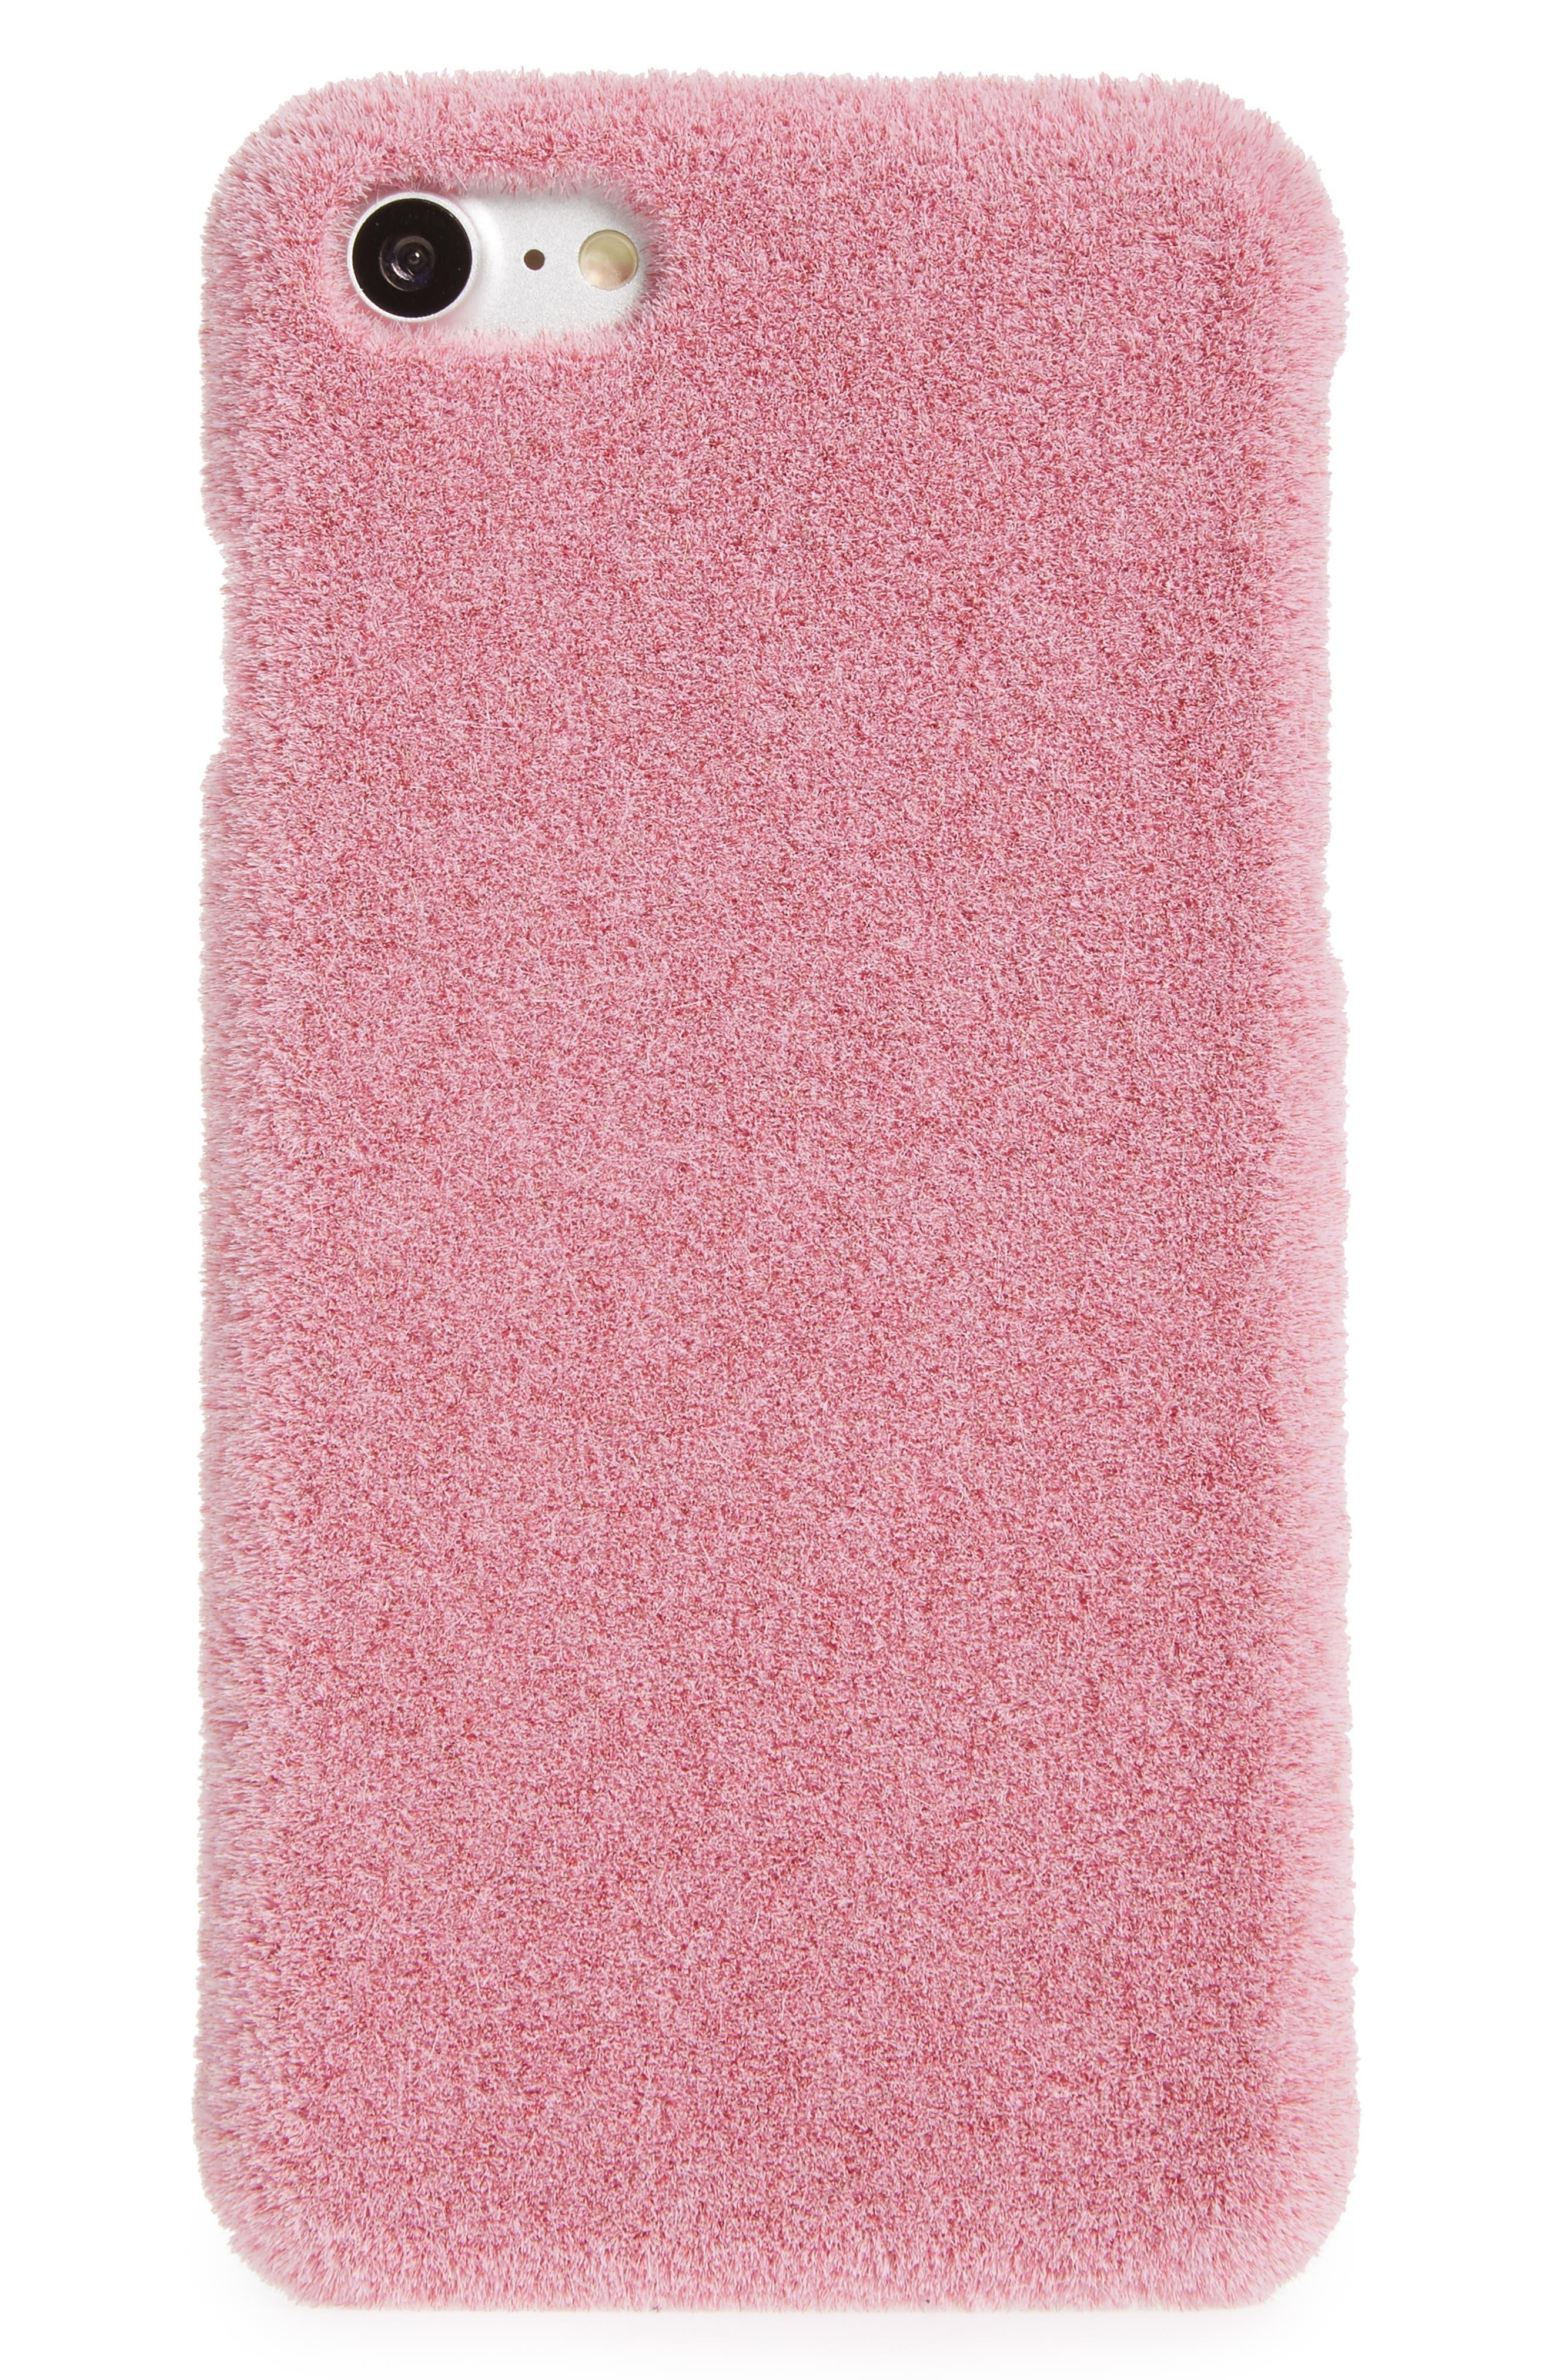 Cherry Blossom Portable Park iPhone 7 & iPhone 7 Plus Case,                             Alternate thumbnail 3, color,                             650